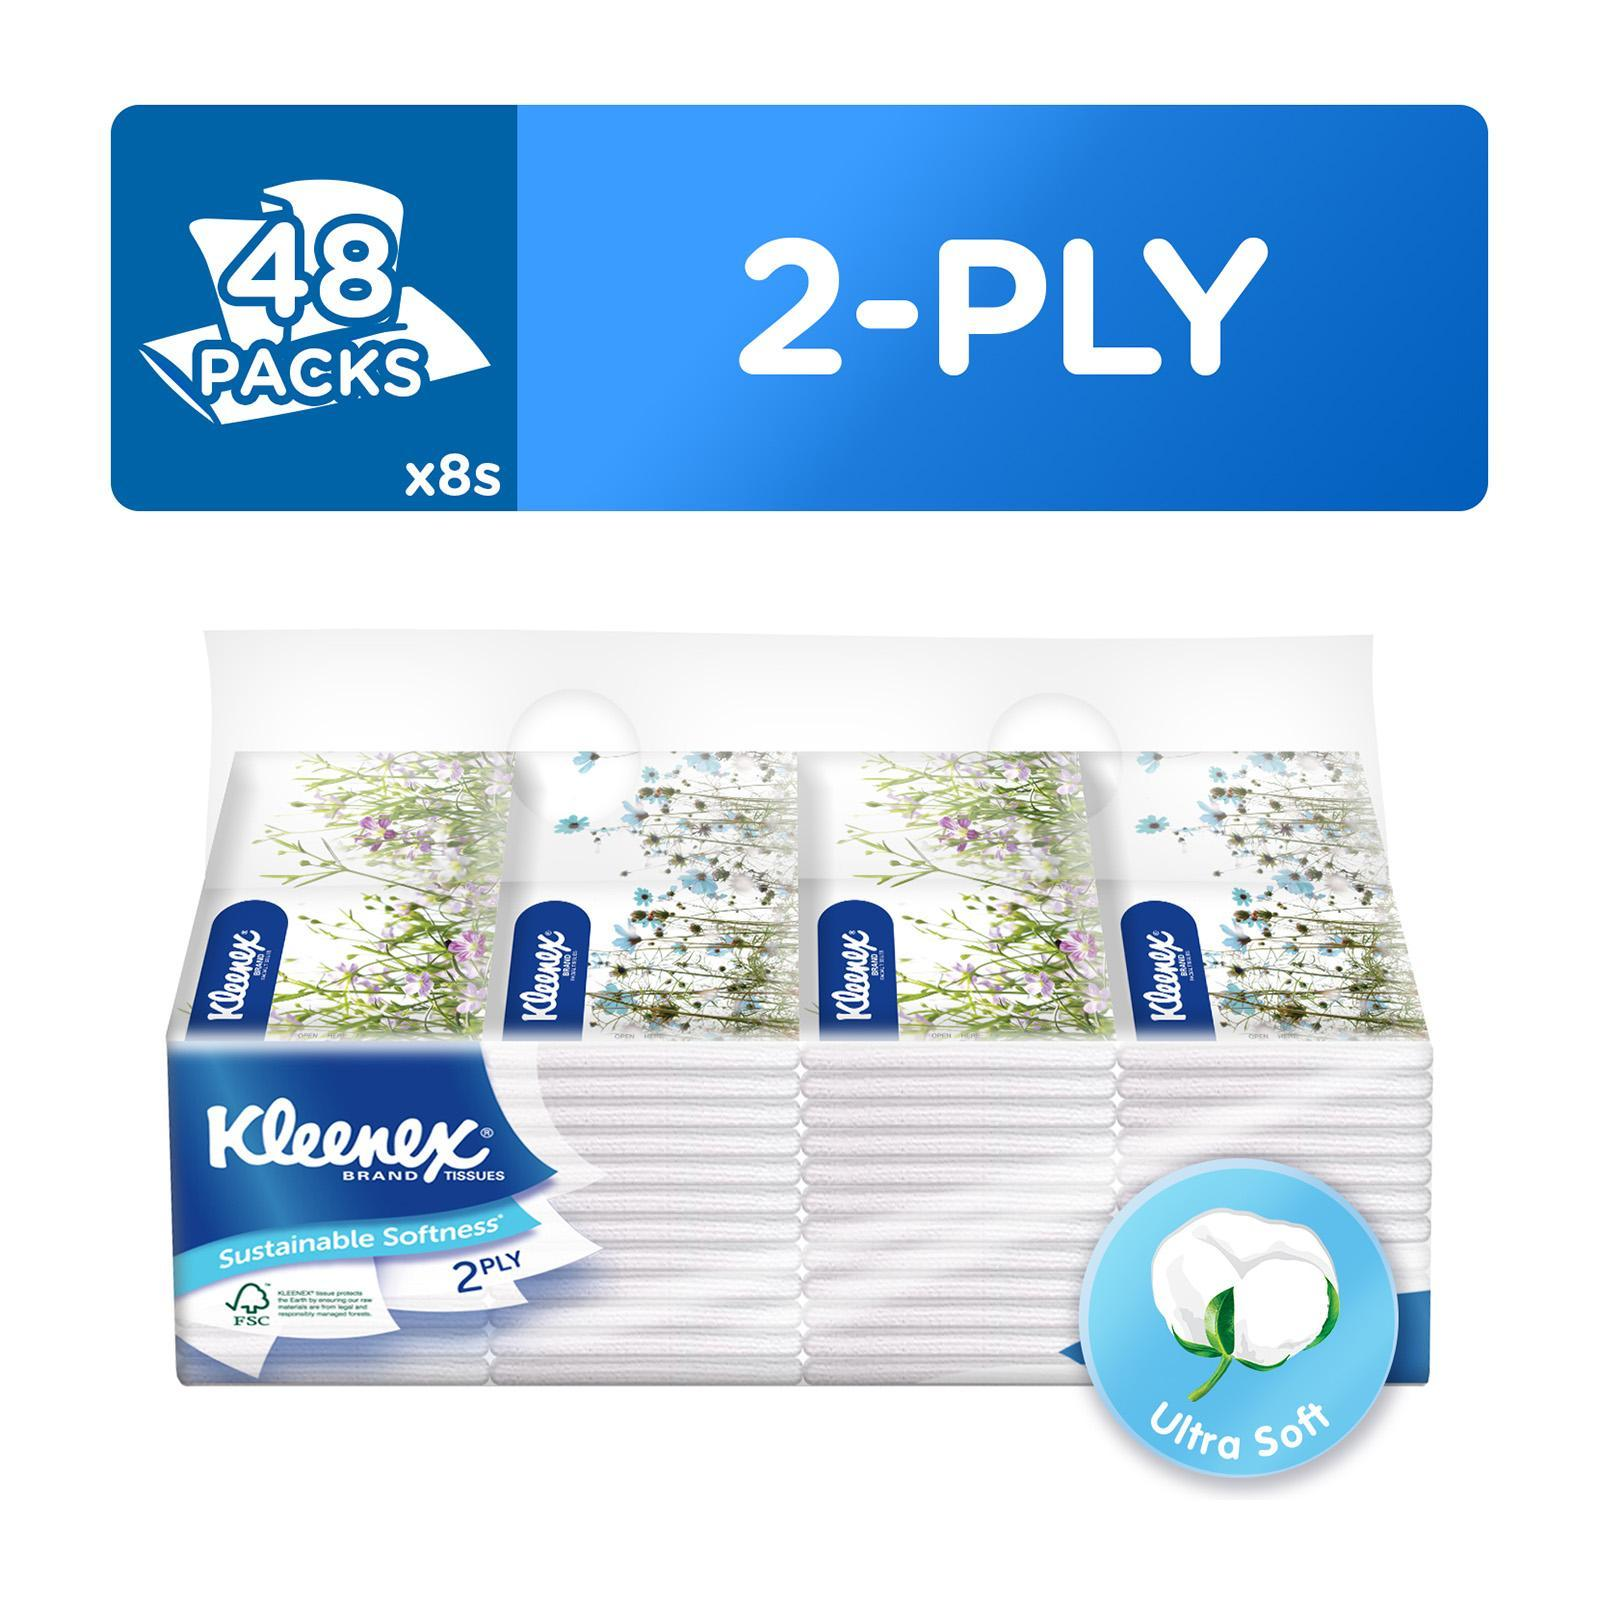 Kleenex 2 Ply Pocket Pack Main